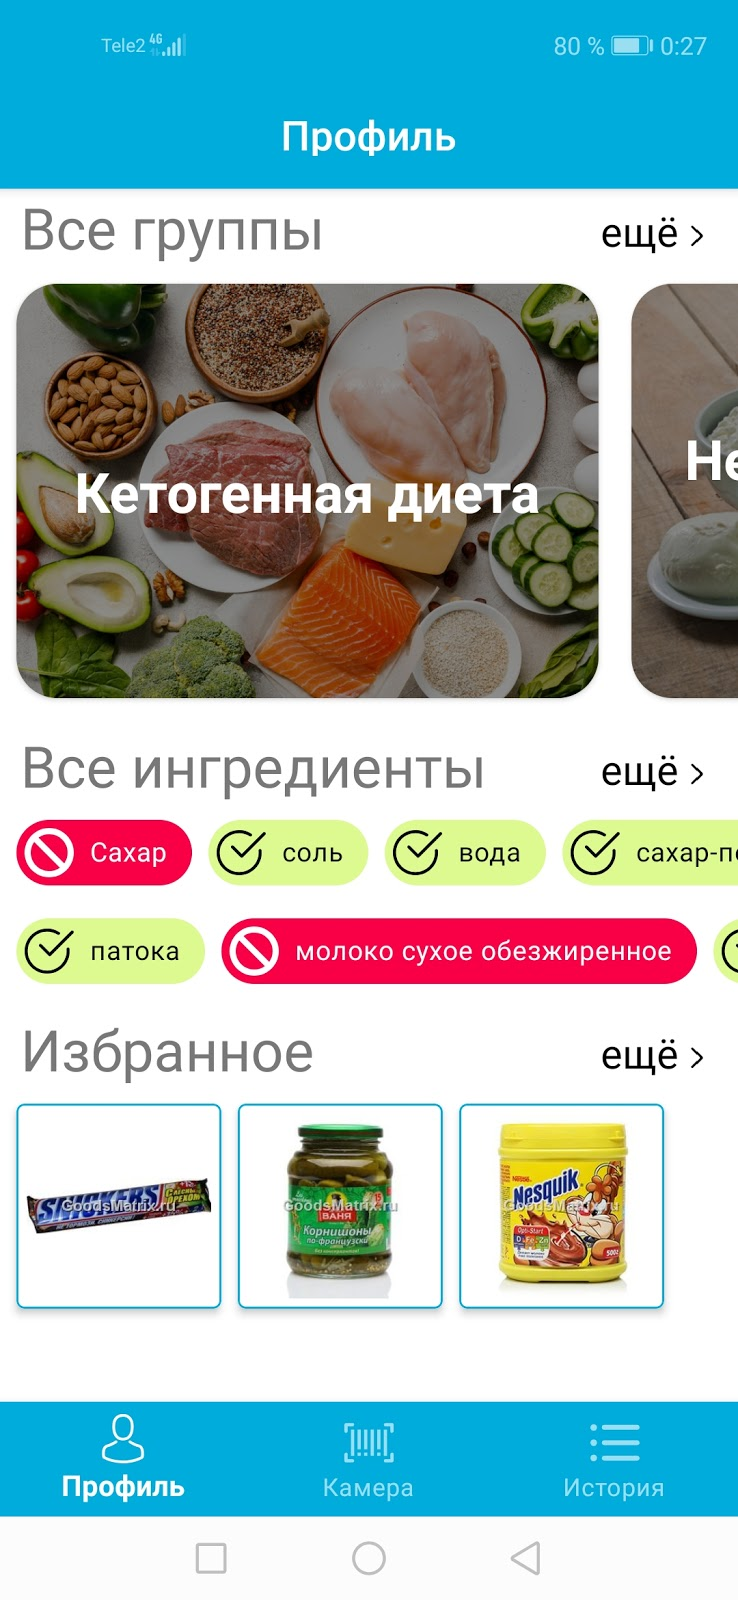 Техновыпуск Mail.ru Group, зима 2019 - 16